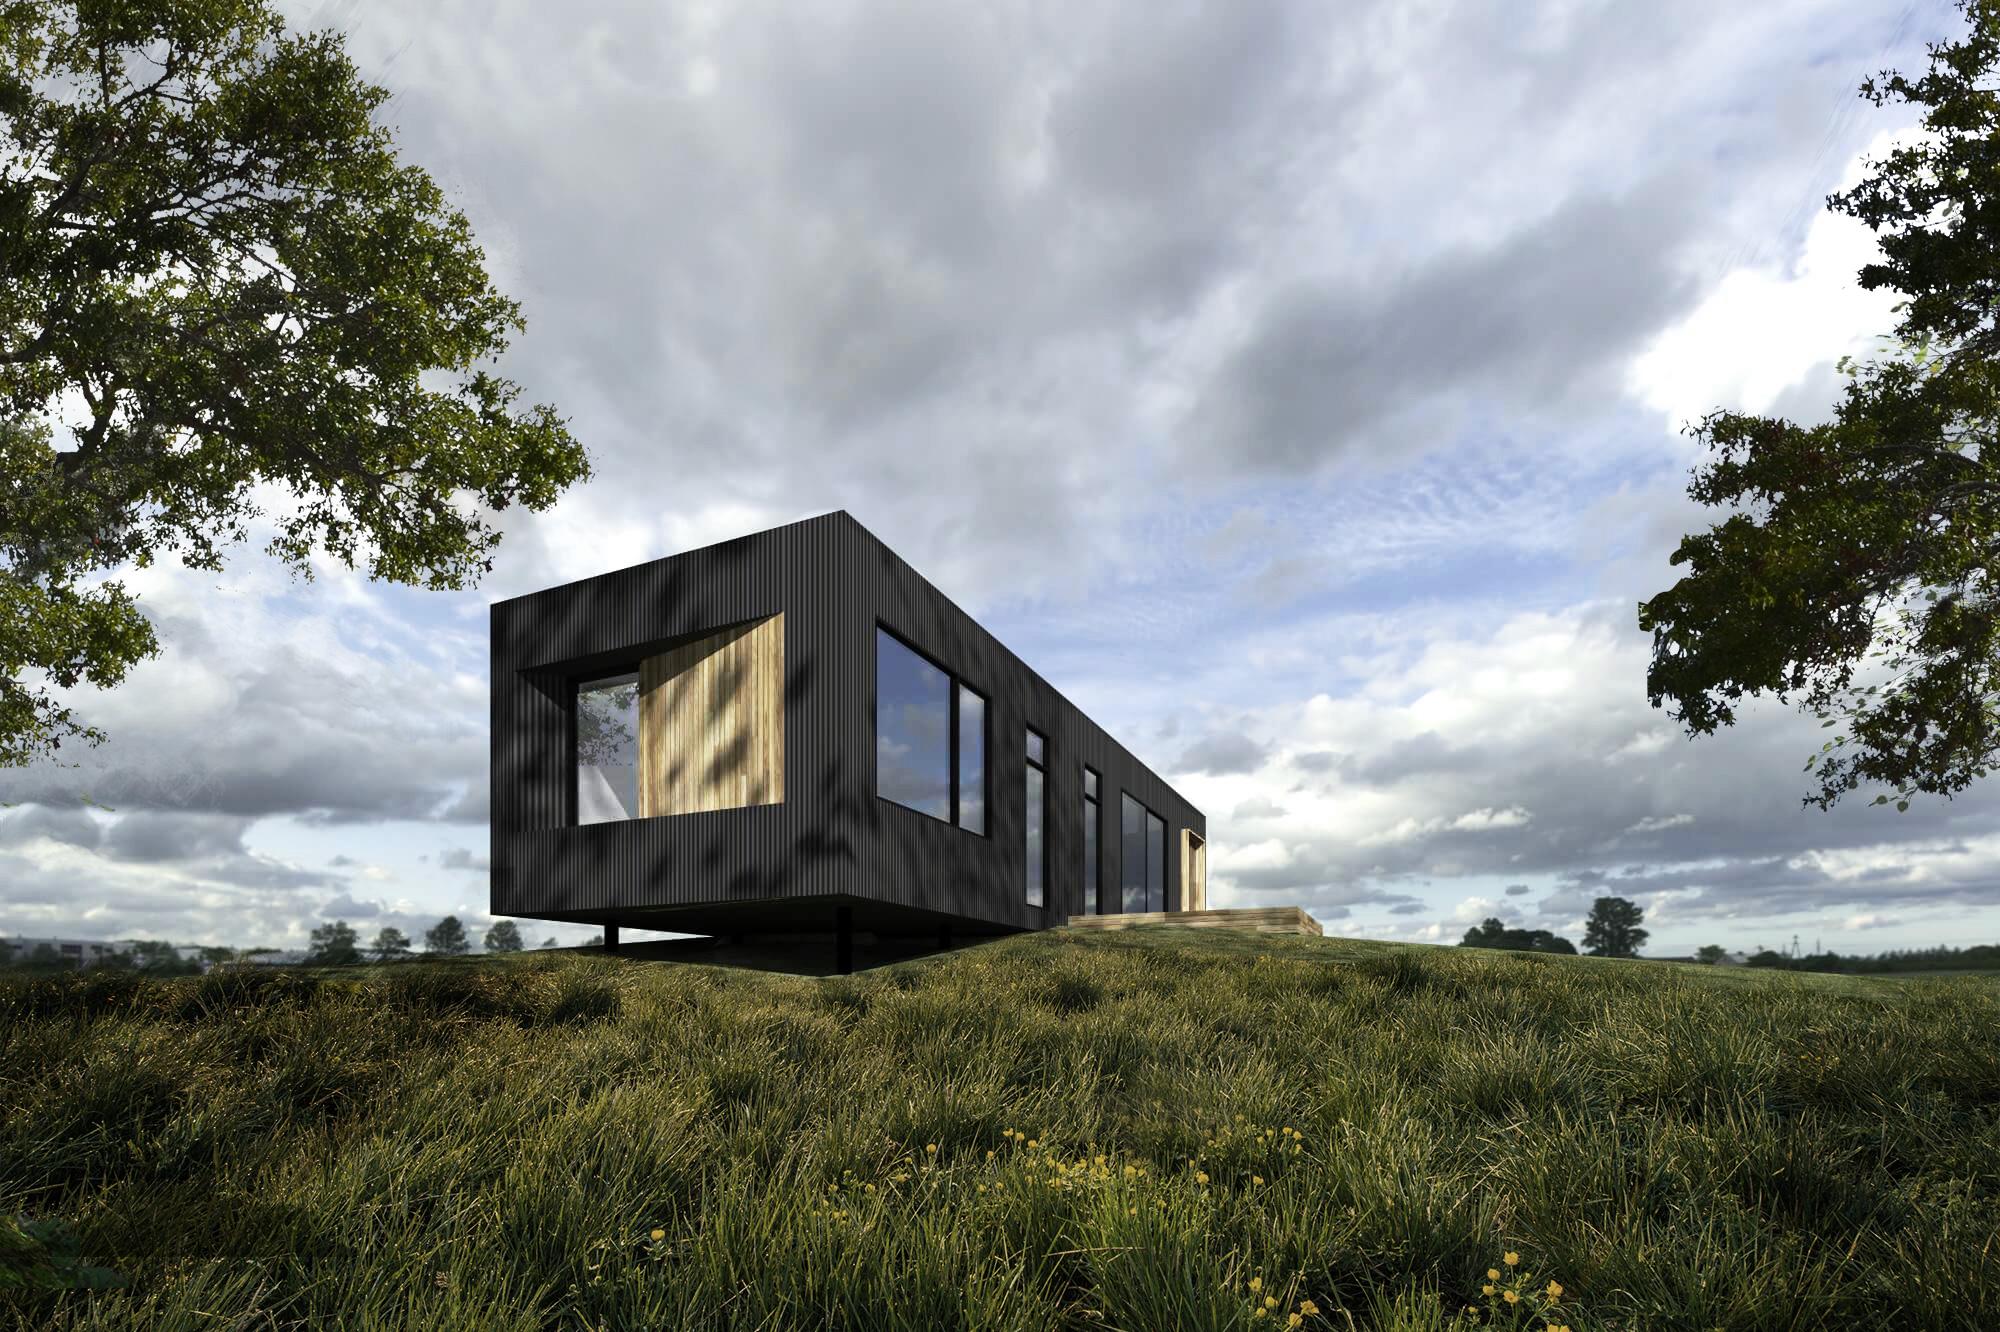 marlo 01 house design image